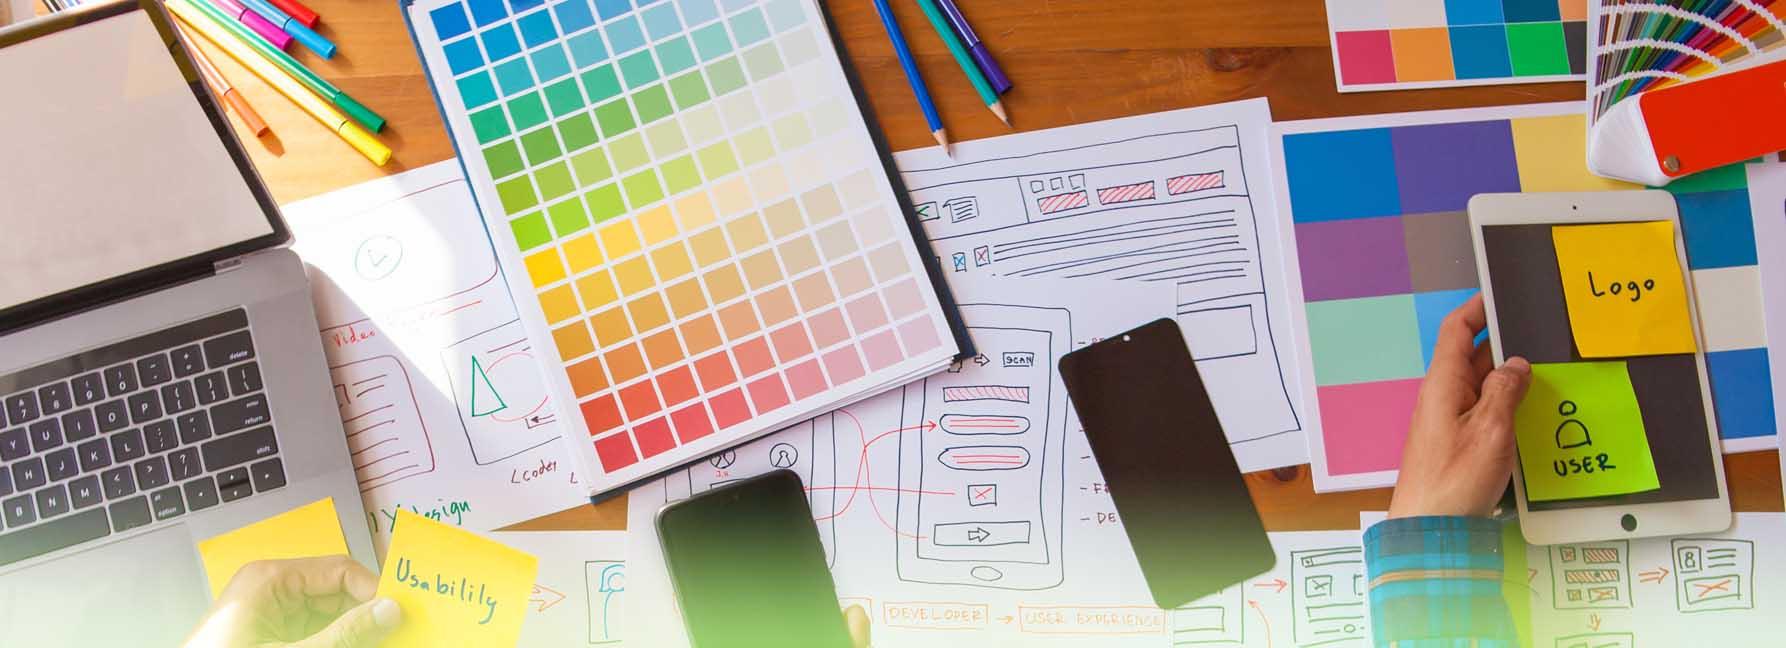 web design carlow